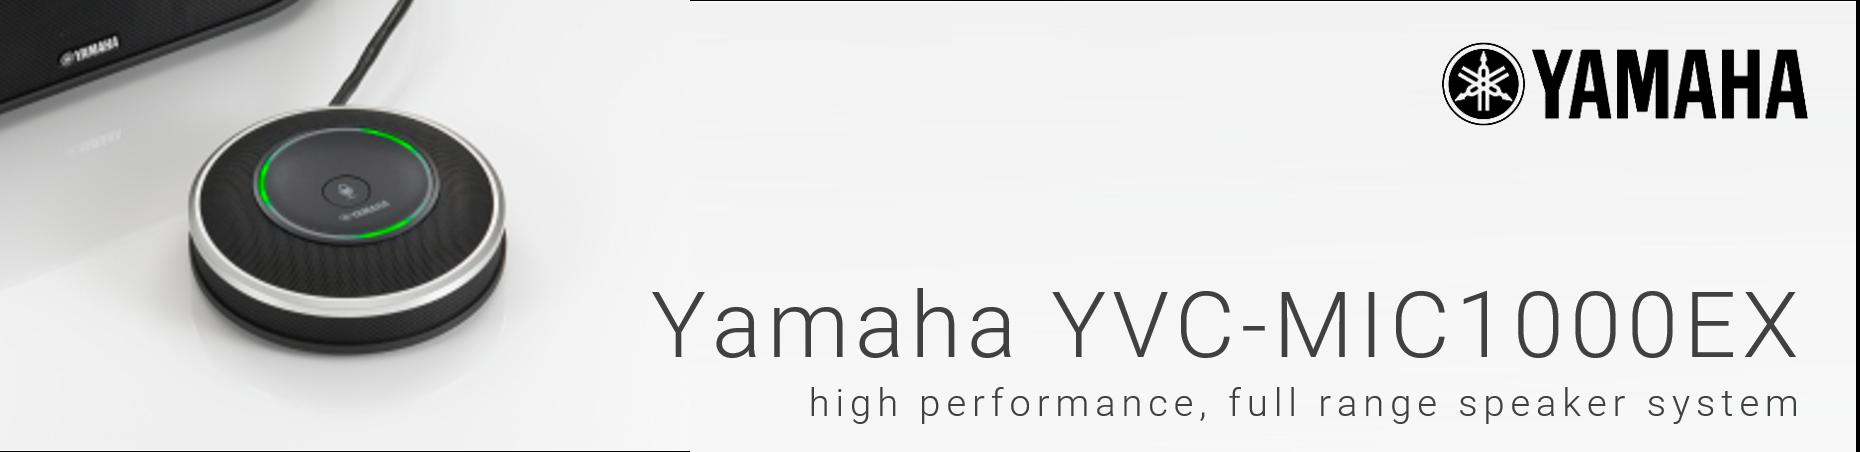 Yamaha YVC-1000 Extension Mic